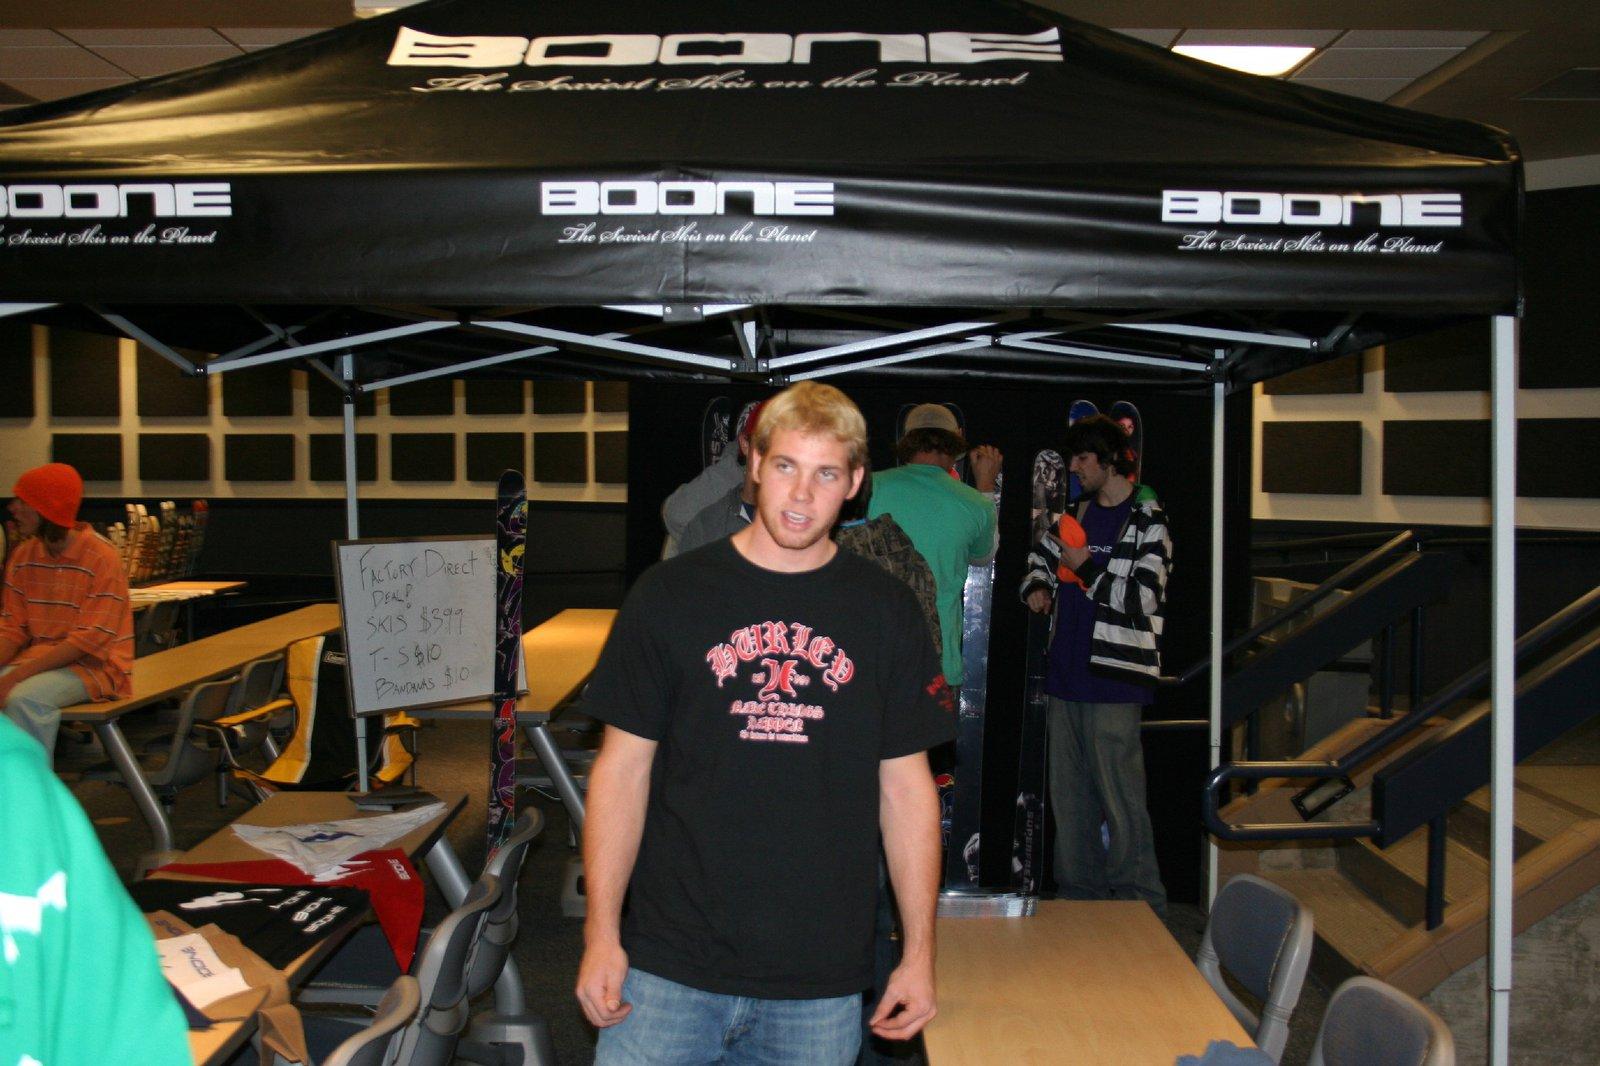 BOONE Tent at Skigasm